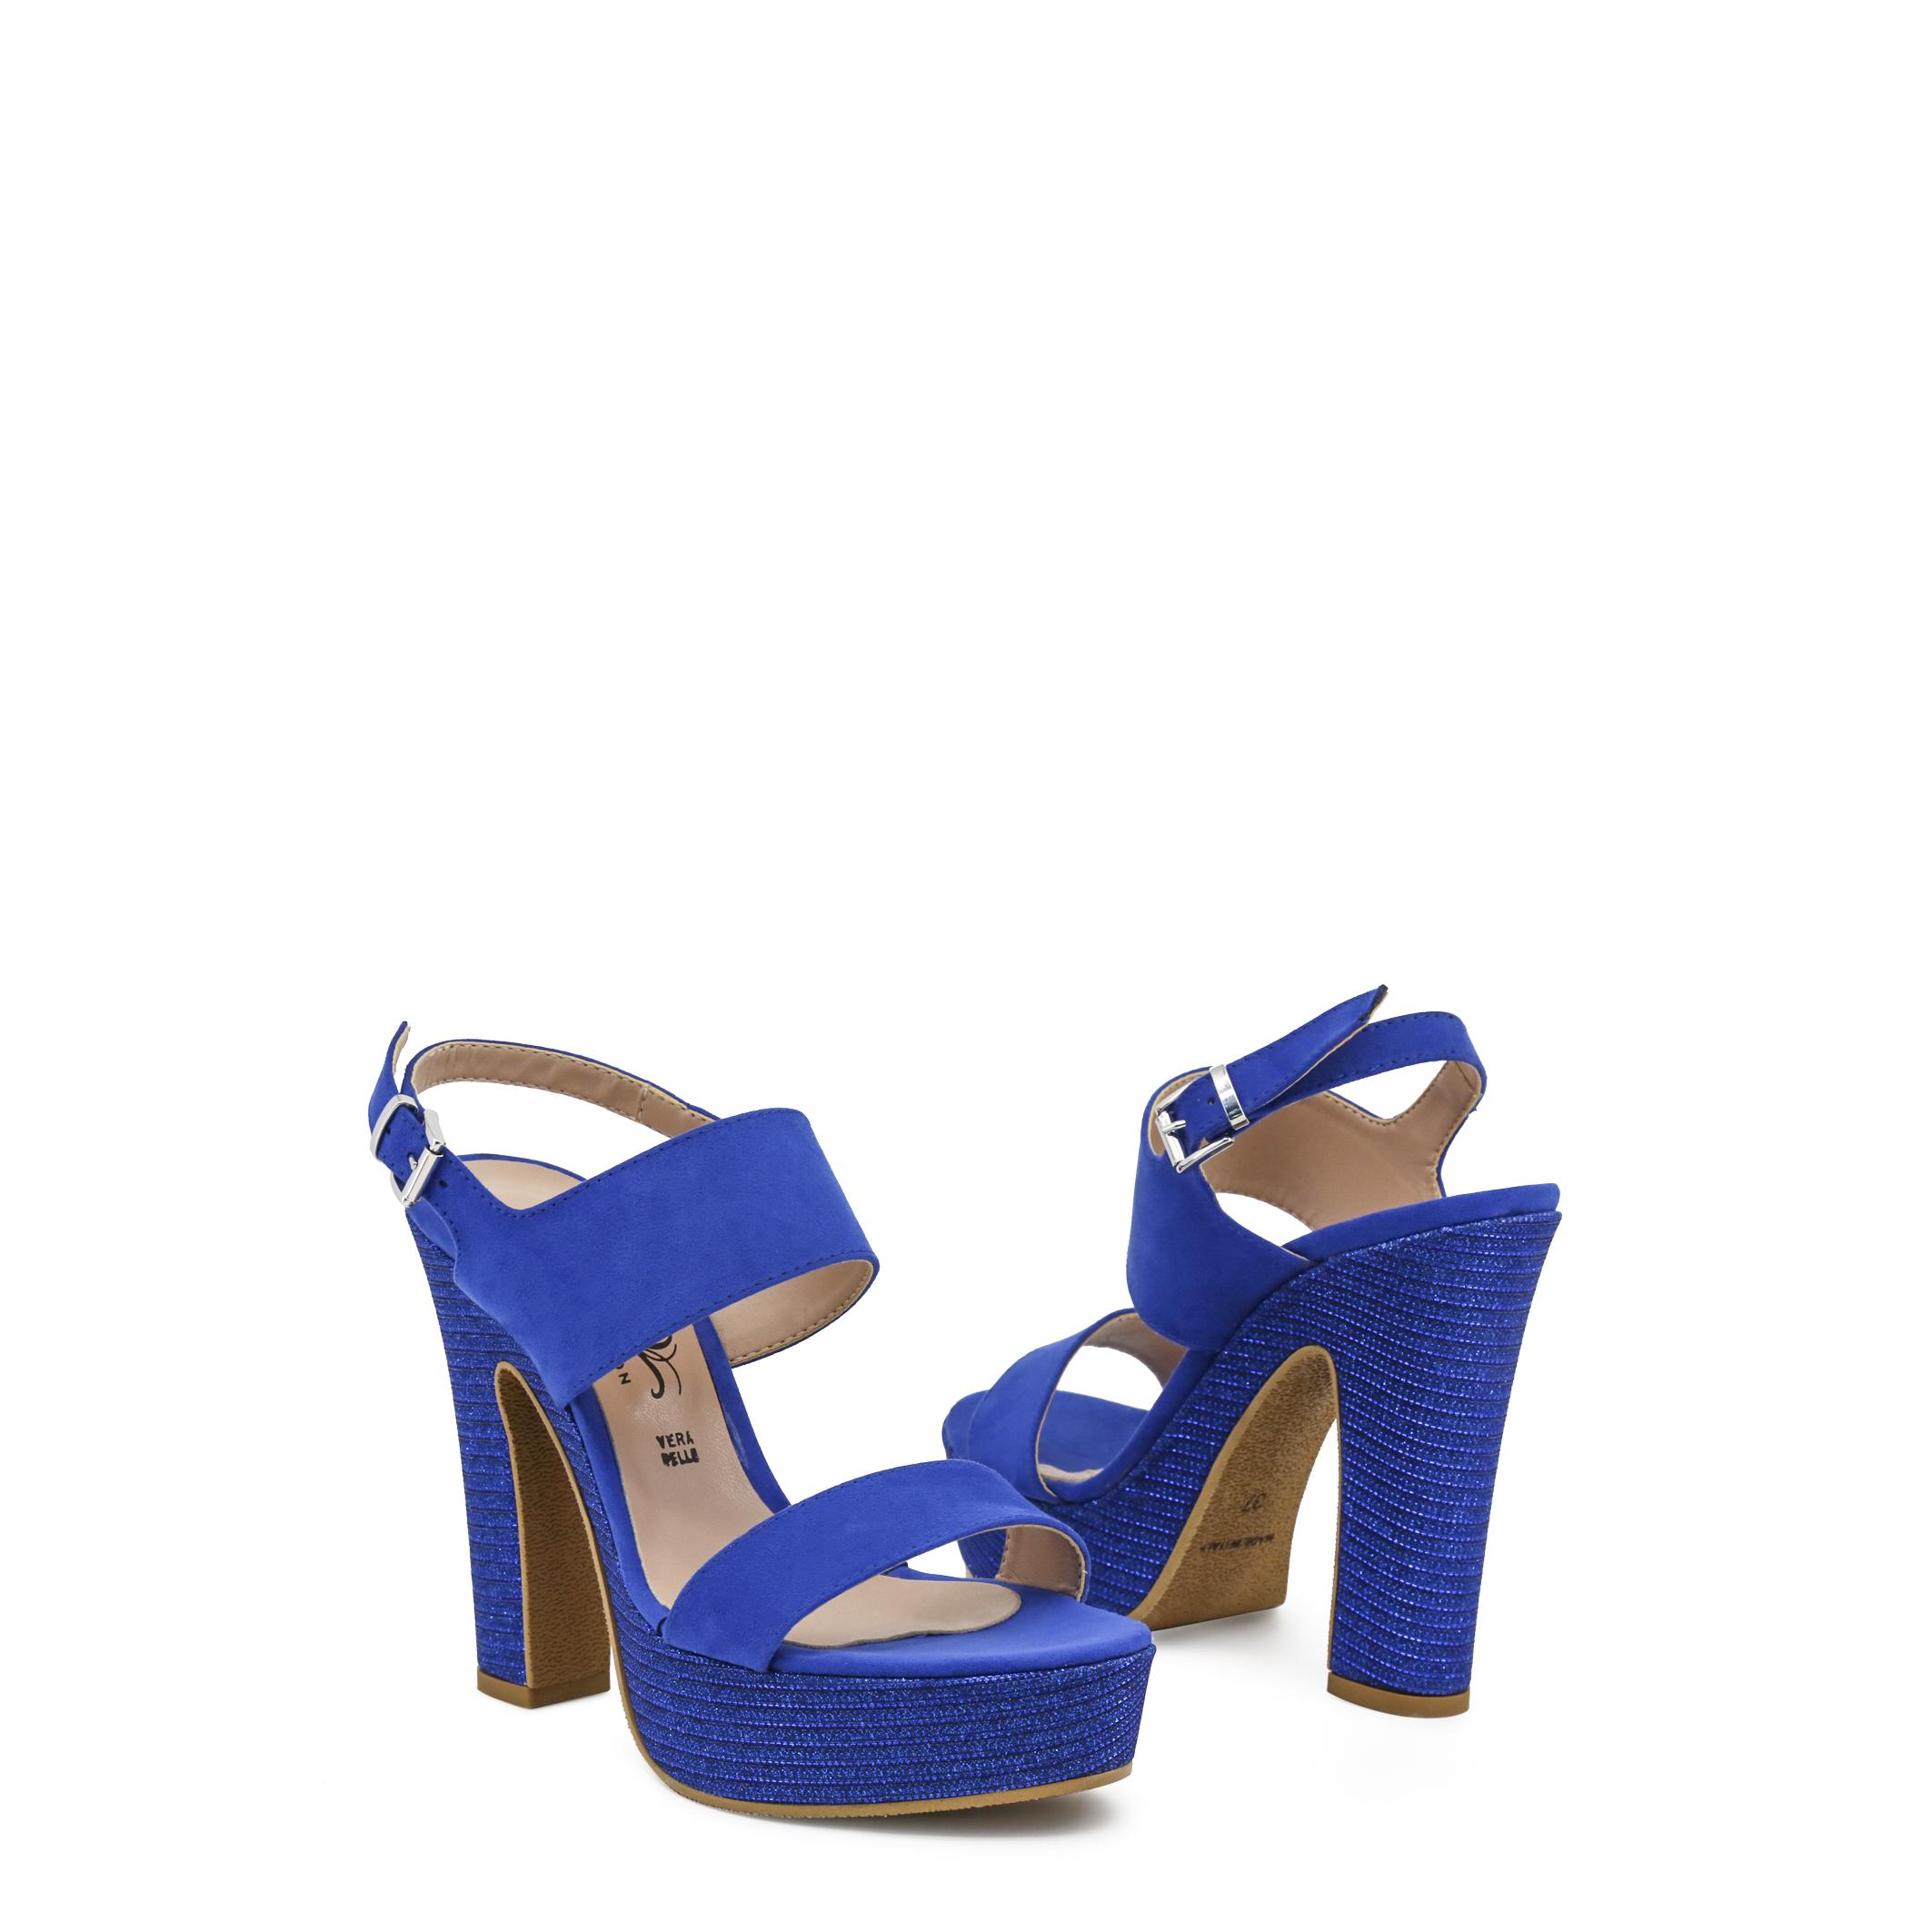 Zapatos-Paris-Hilton-Mujer-2212P-Sandalias-Azul-Rosa-cuna-tacon